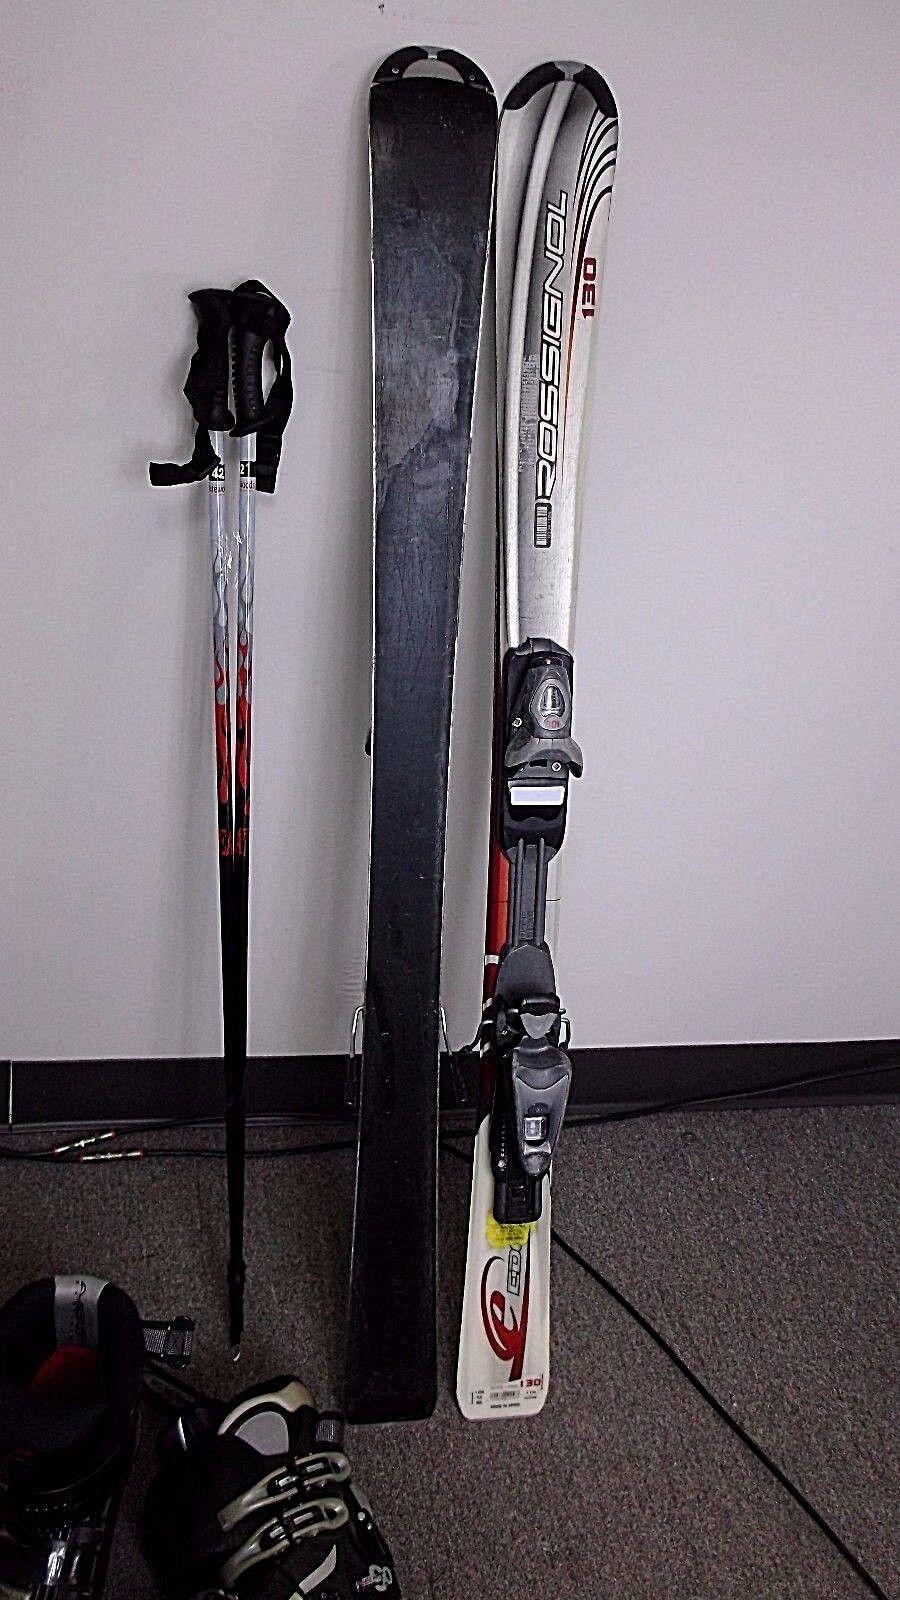 Ski Package, USED Rossignol Edge Cut SKIS, Adj.Salomon Bindings,  botas  & Poles  precioso